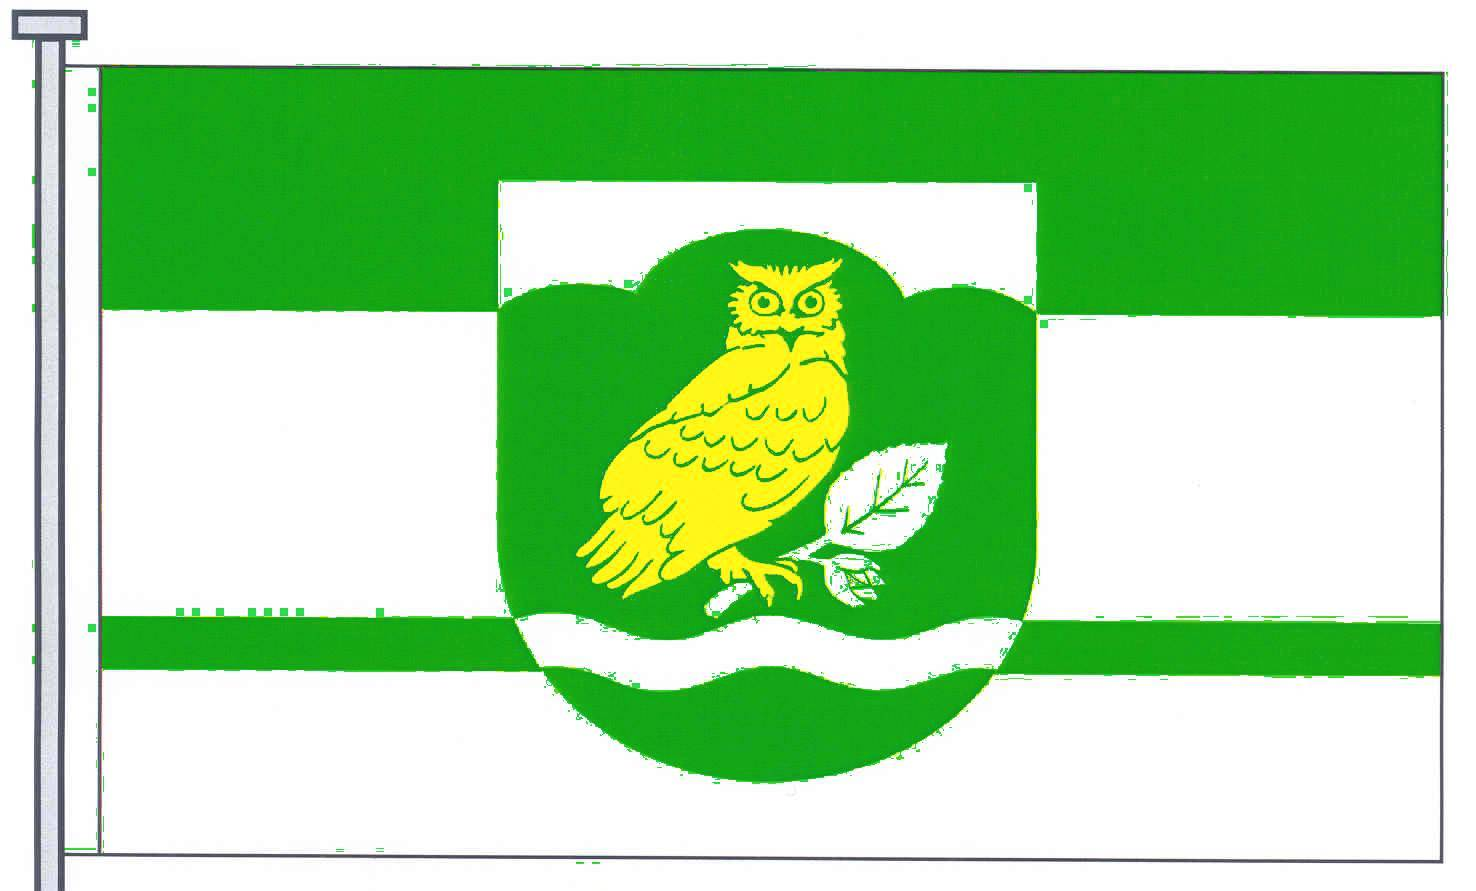 Flagge GemeindeWinsen, Kreis Segeberg